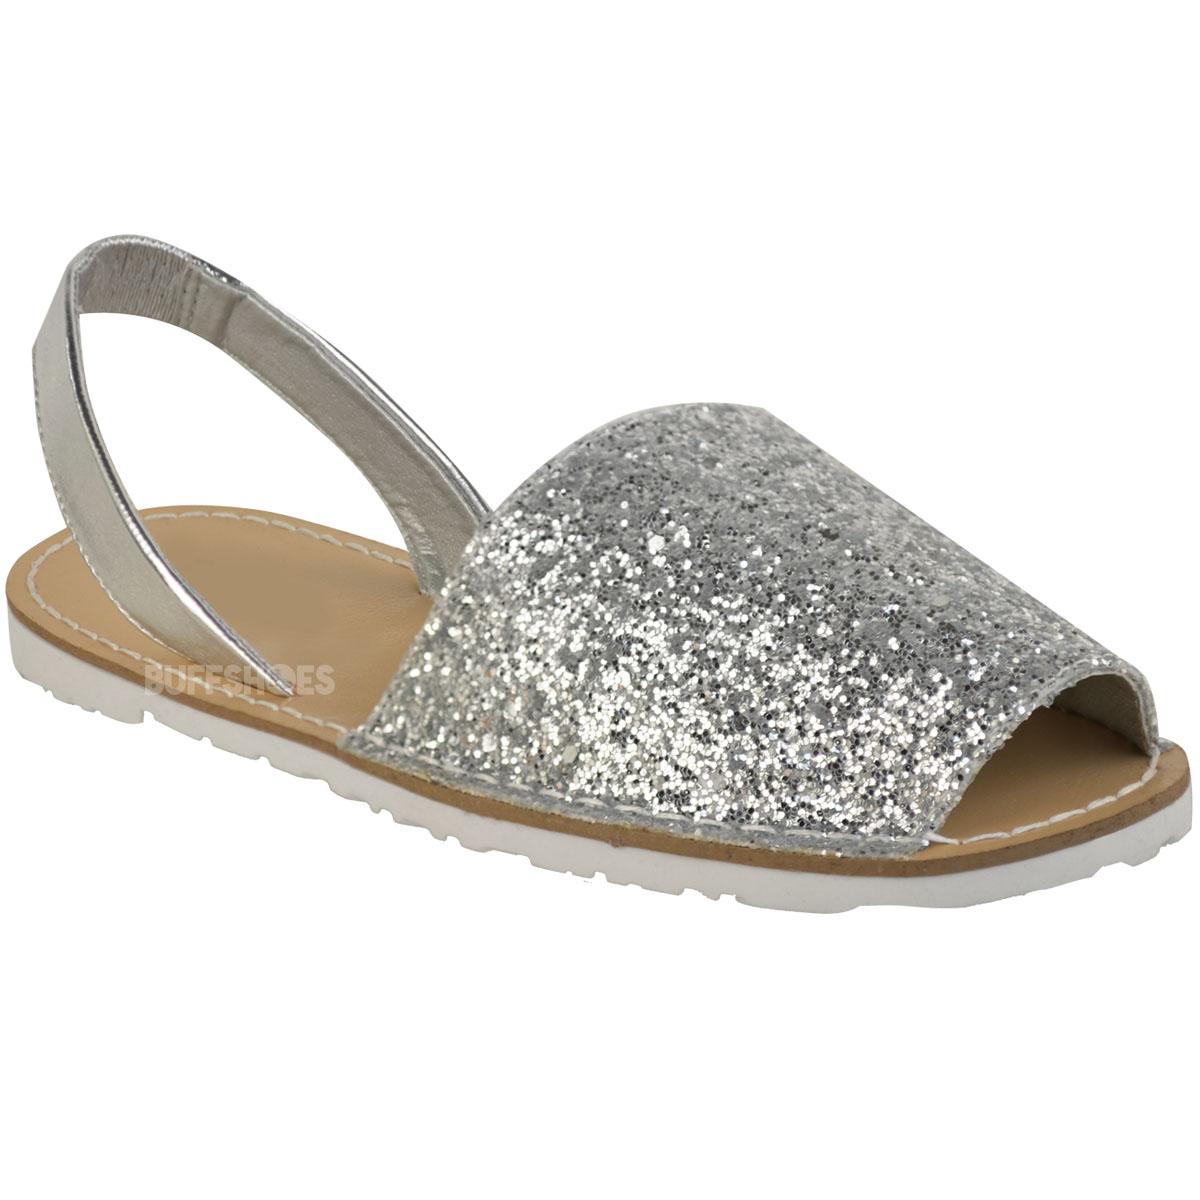 womens ladies summer menorcan glitter sandals slingback. Black Bedroom Furniture Sets. Home Design Ideas